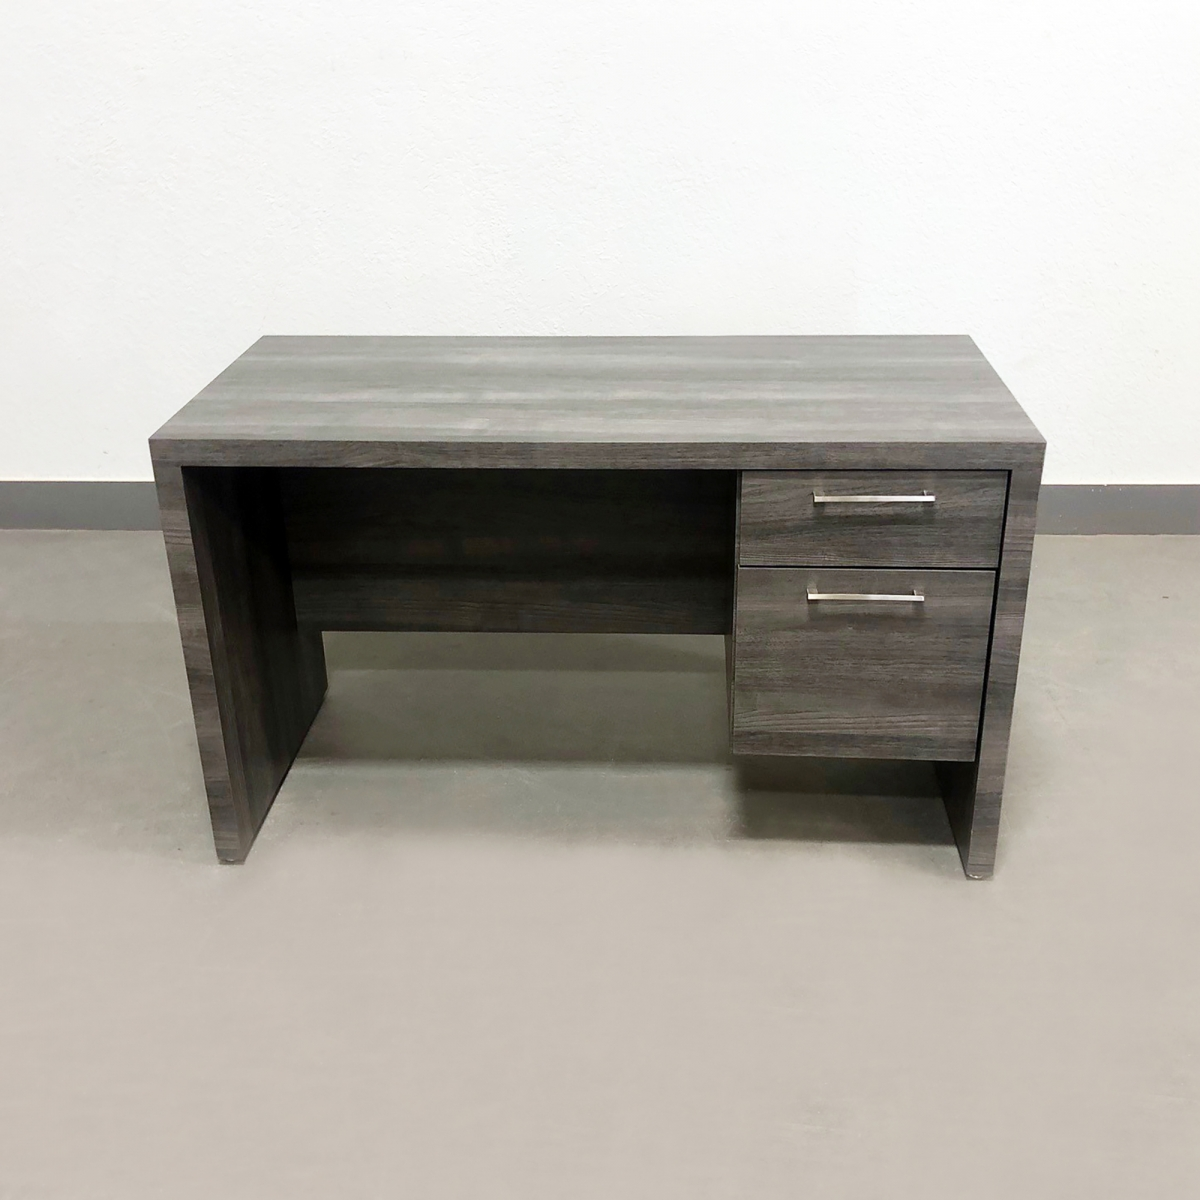 Denver Office Desk in Gray Laminate 52